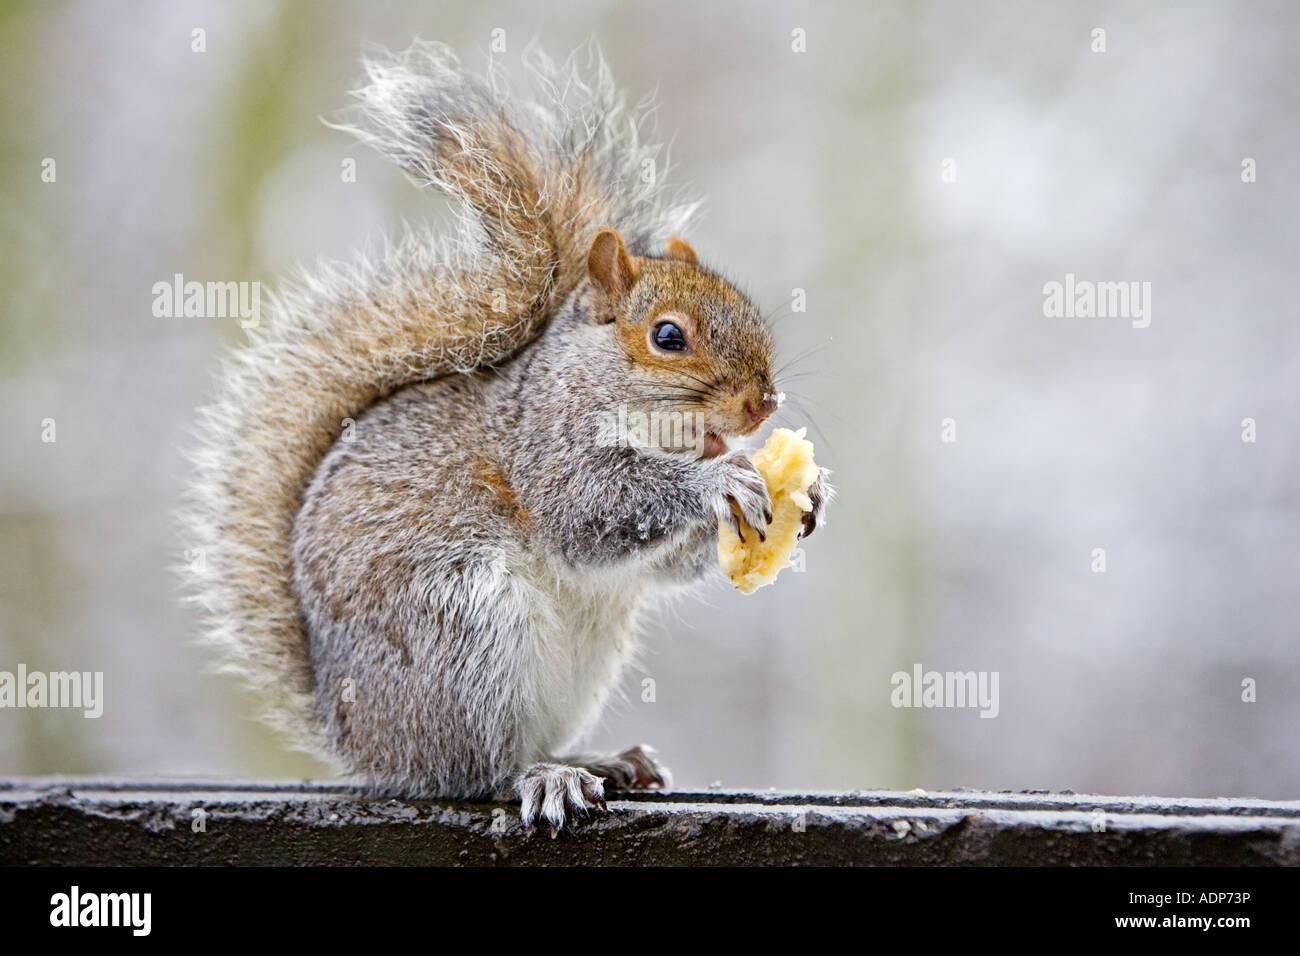 Grey squirrel eats scraps from rubbish bin in Hampstead Heath London United Kingdom - Stock Image